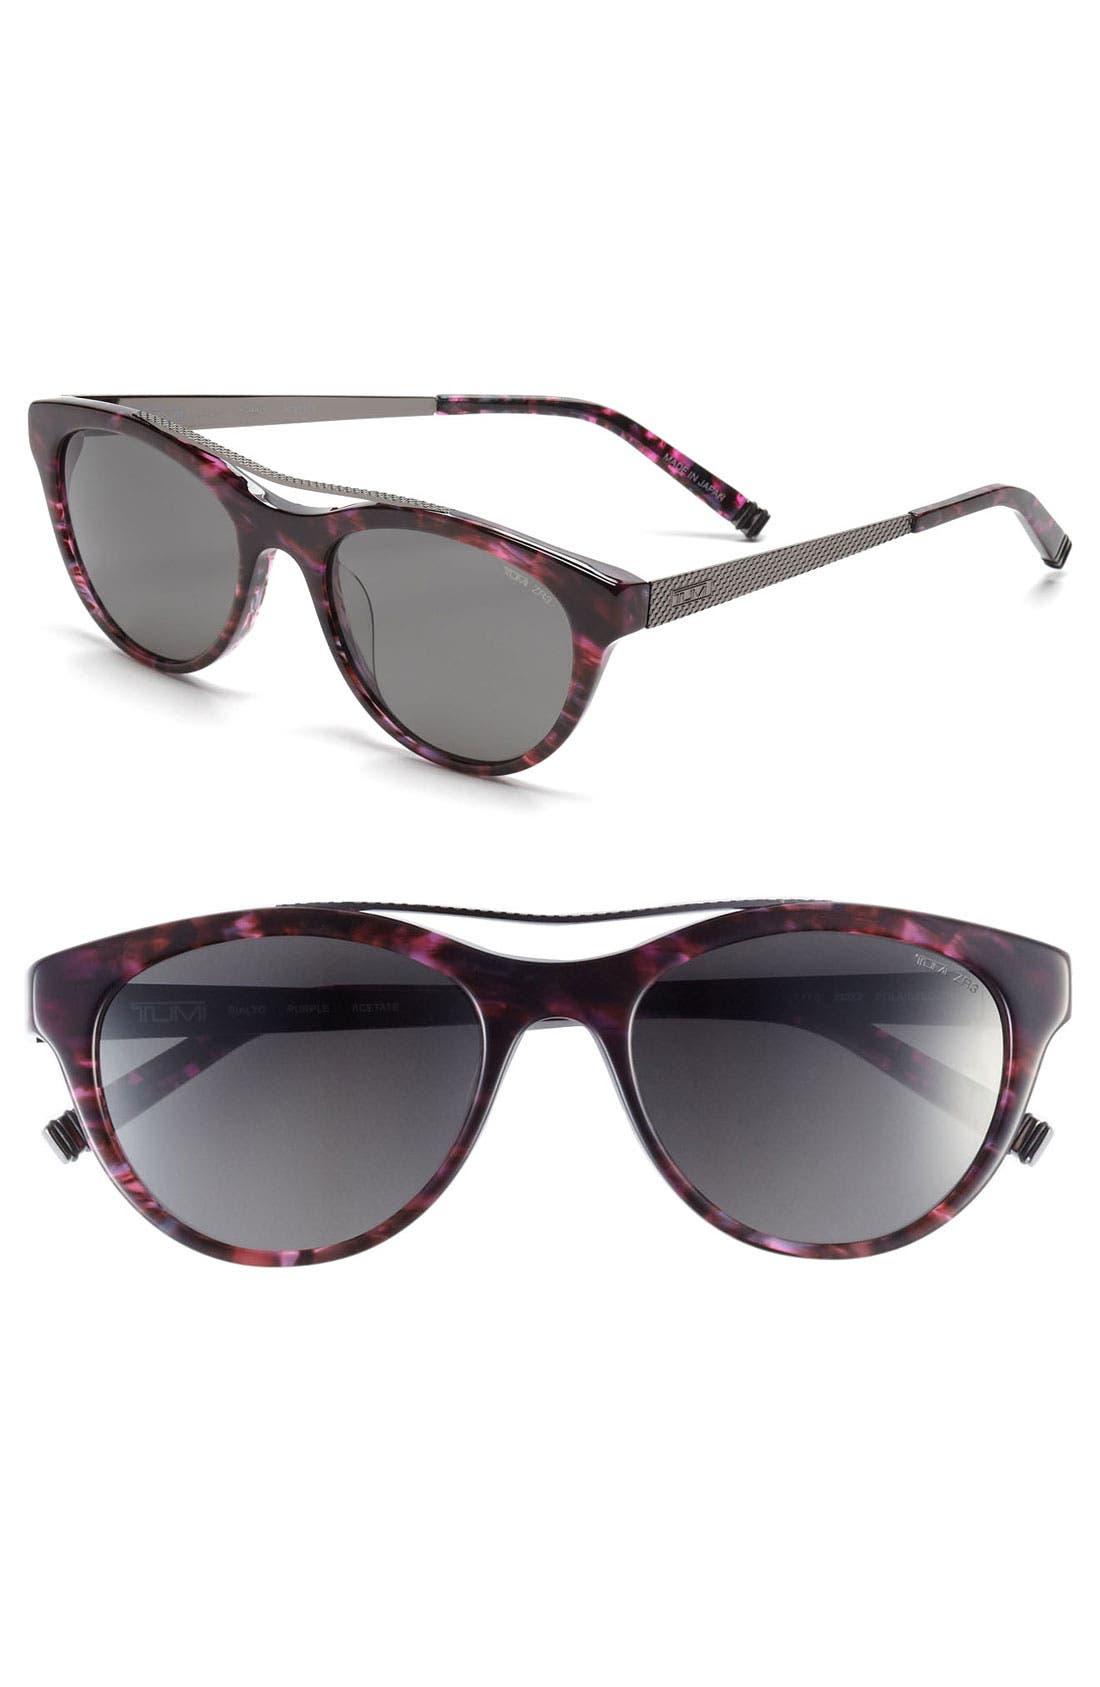 Alternate Image 1 Selected - Tumi 'Rialto' 51mm Polarized Sunglasses